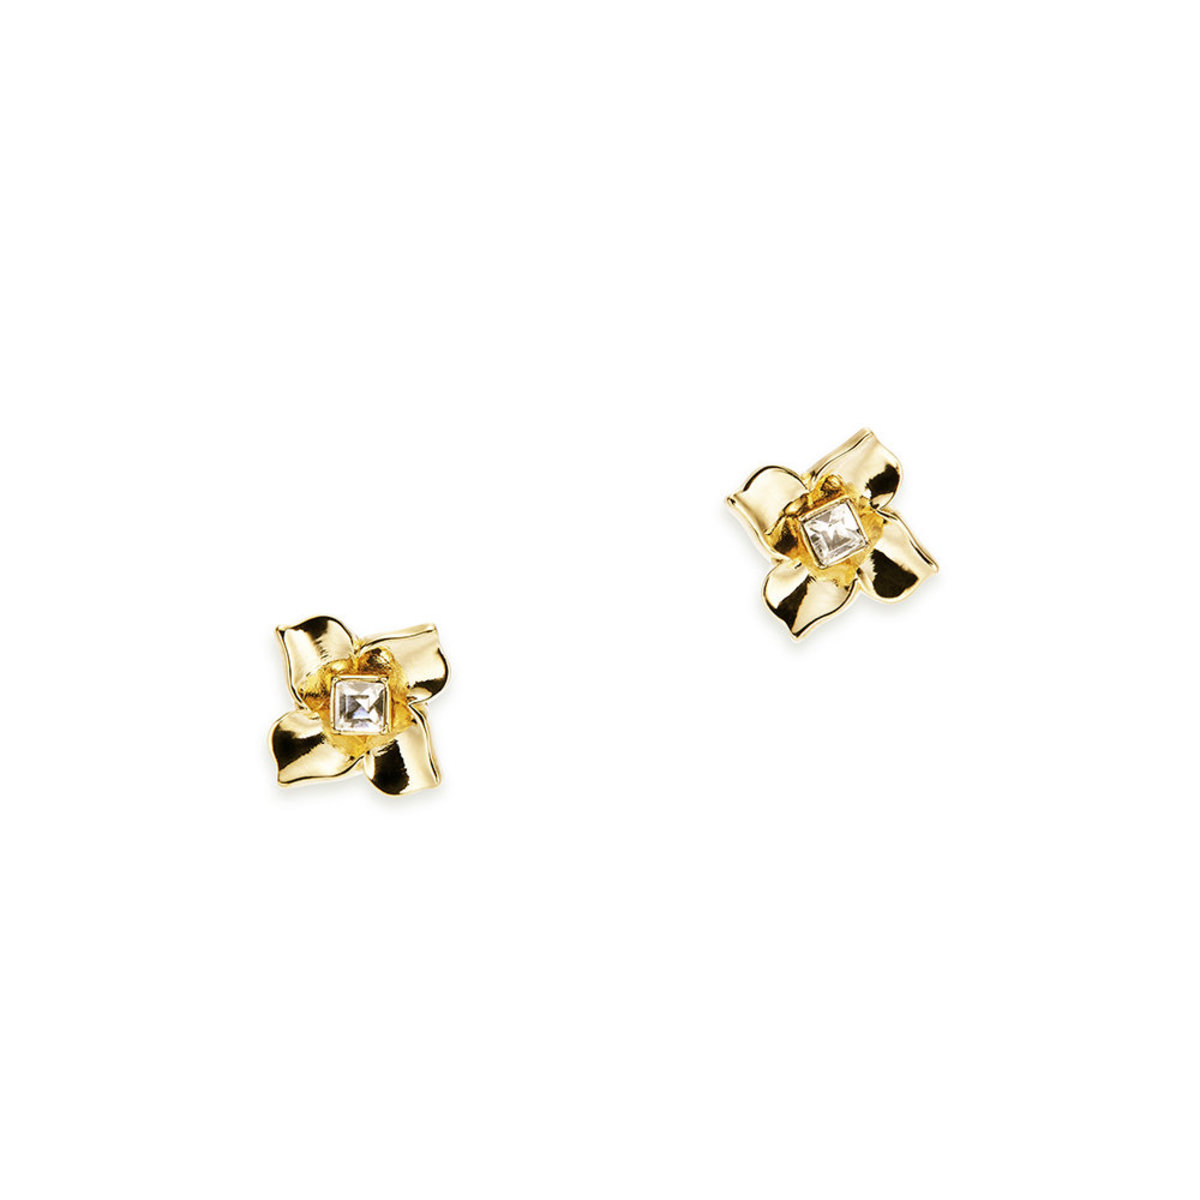 Lulud: gold plating, Swarovski crystal, flower pierced earrings